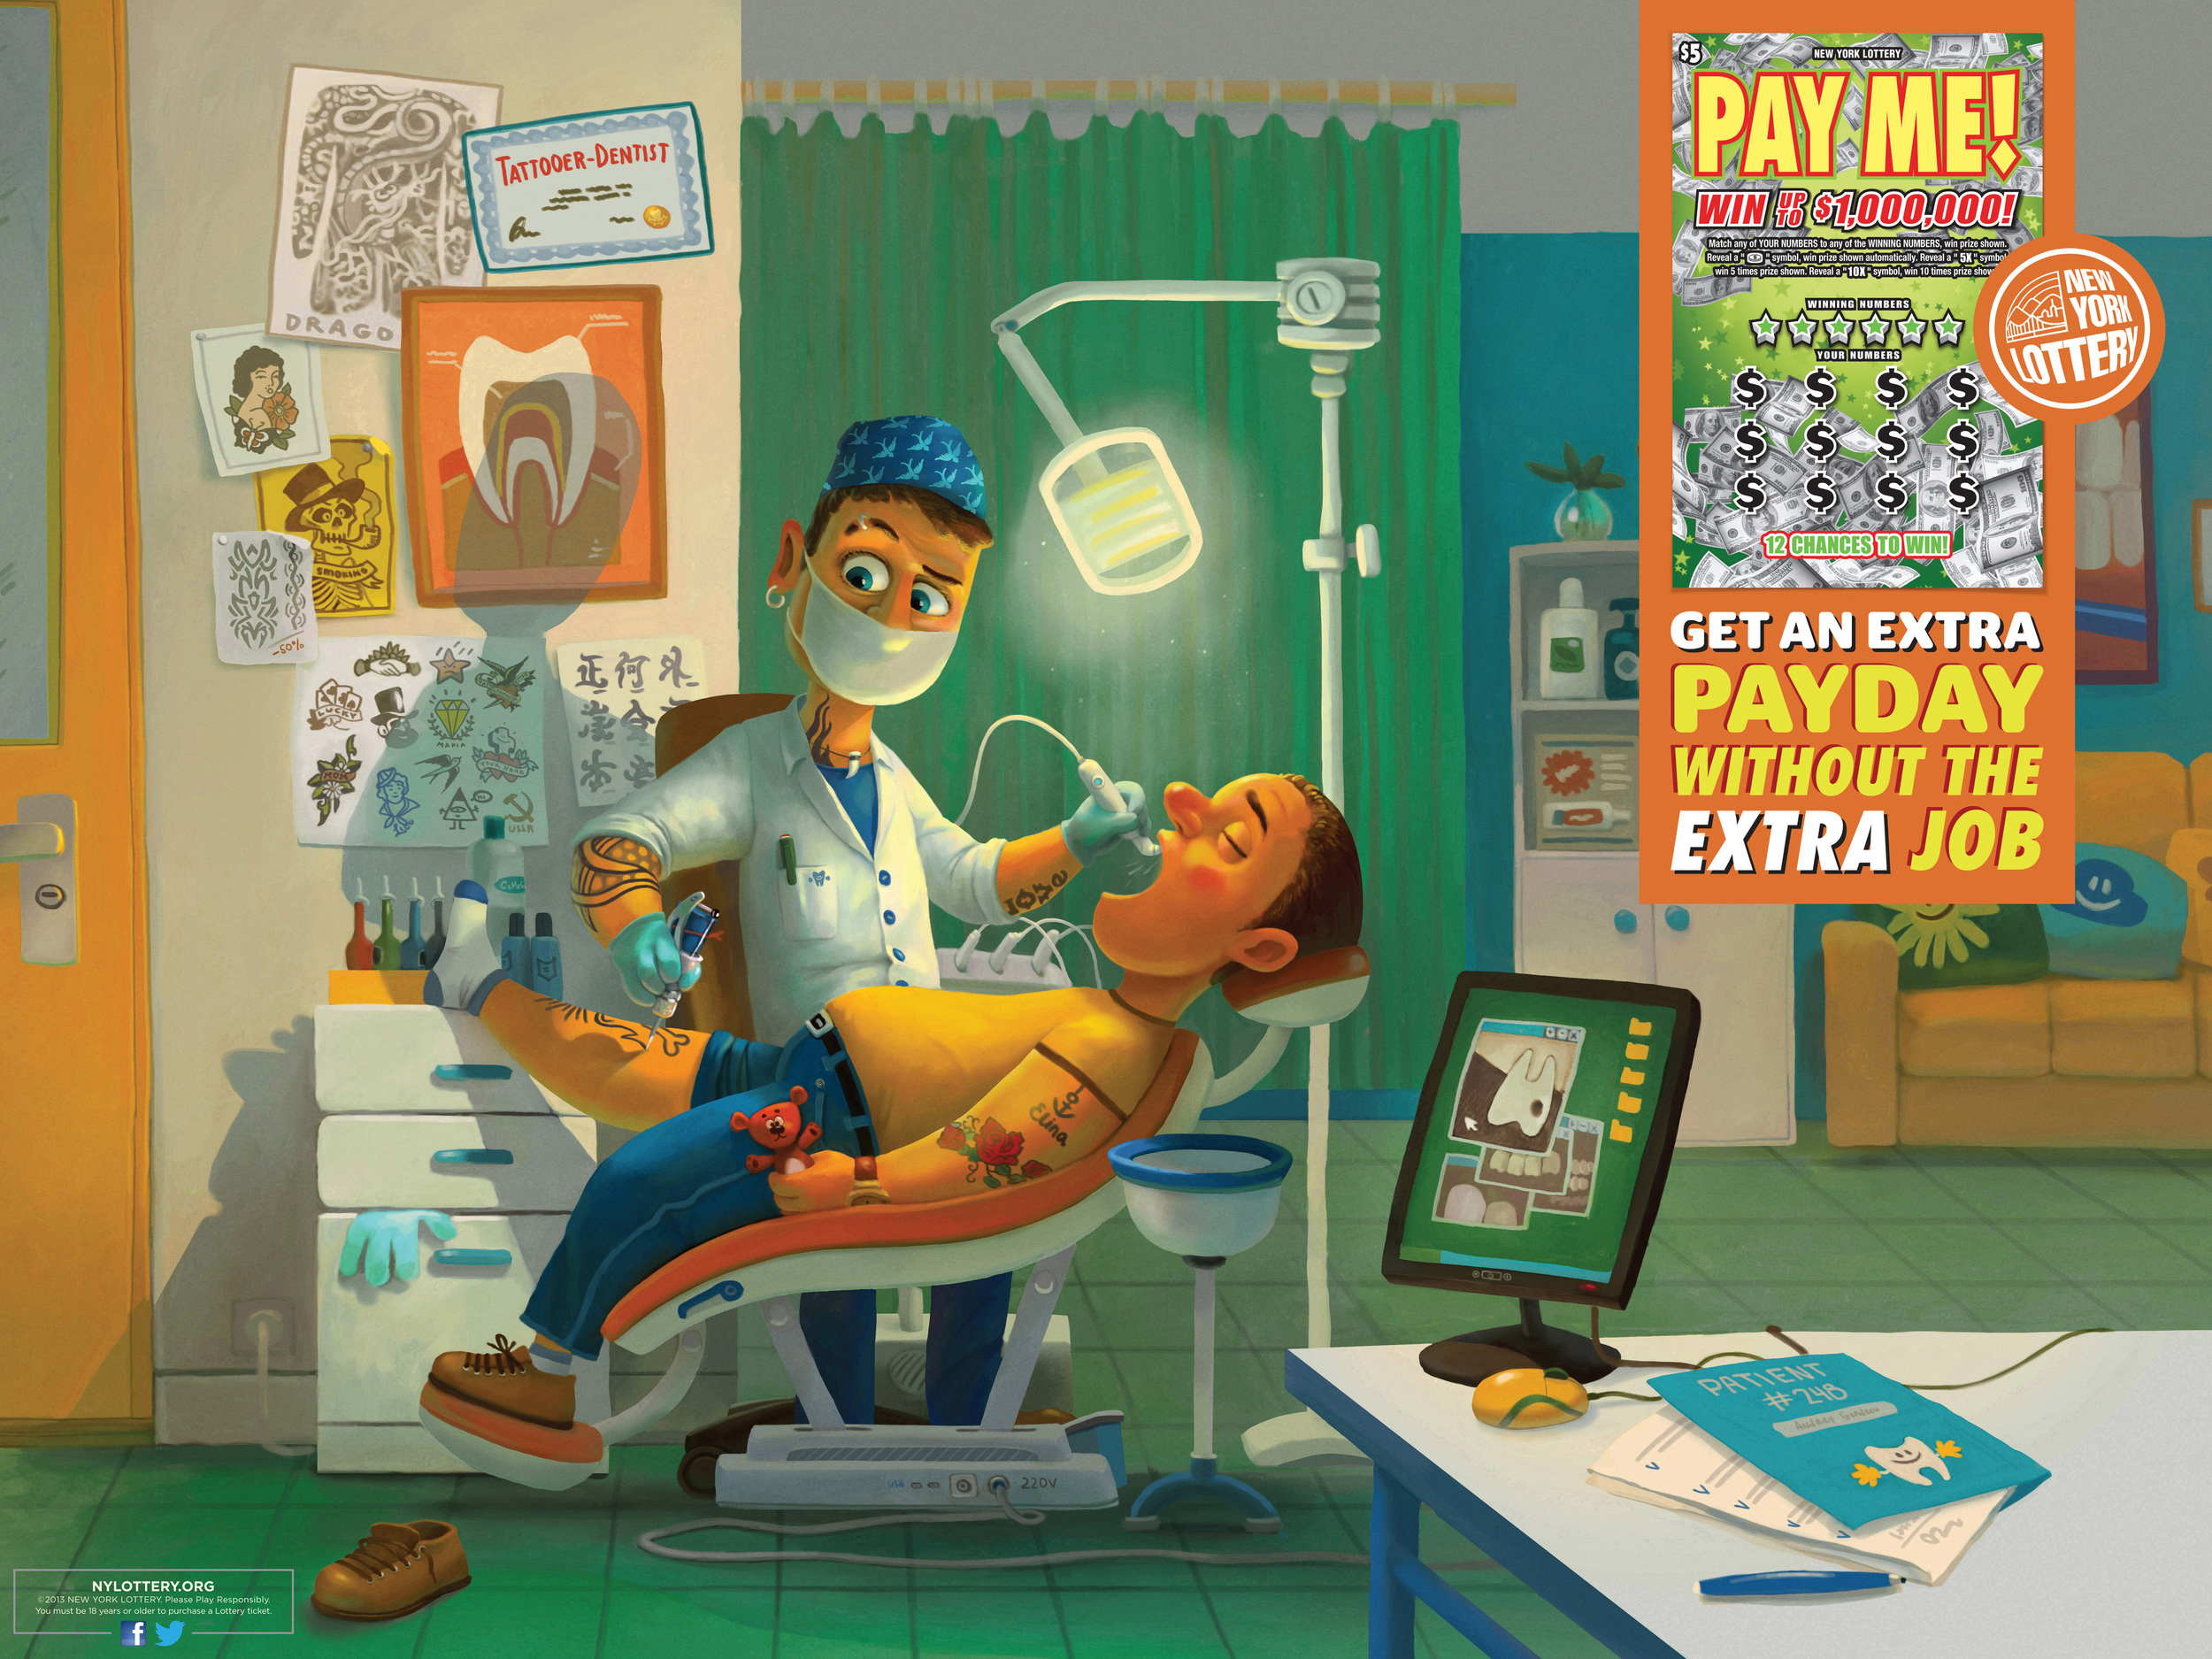 NYLottery_PayMe_Dentist.jpg